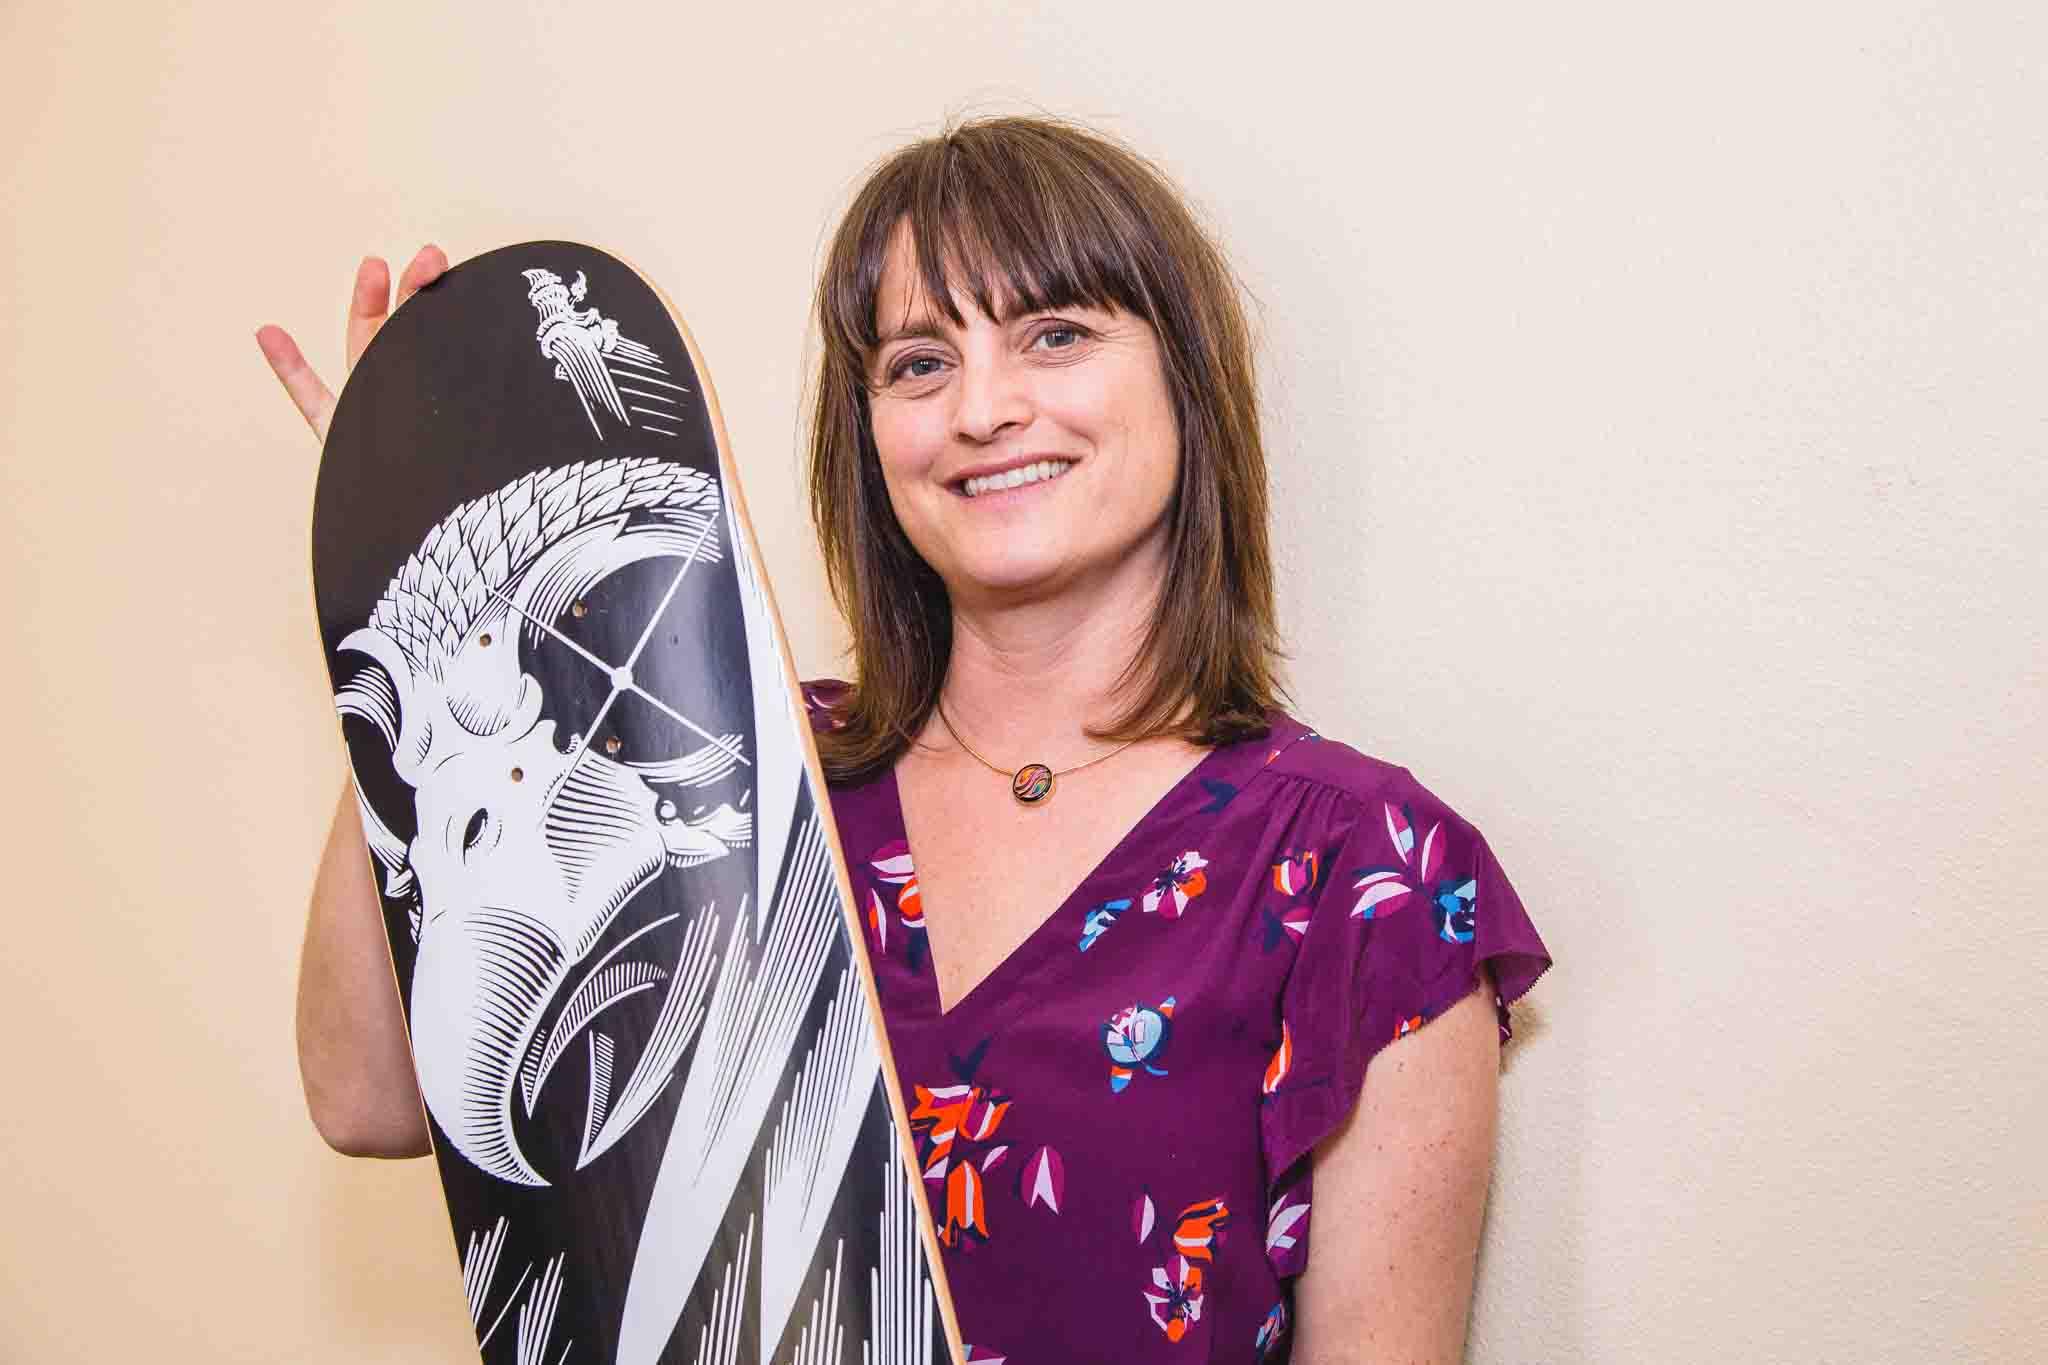 tony hawk foundation grant to support study of skateboarding